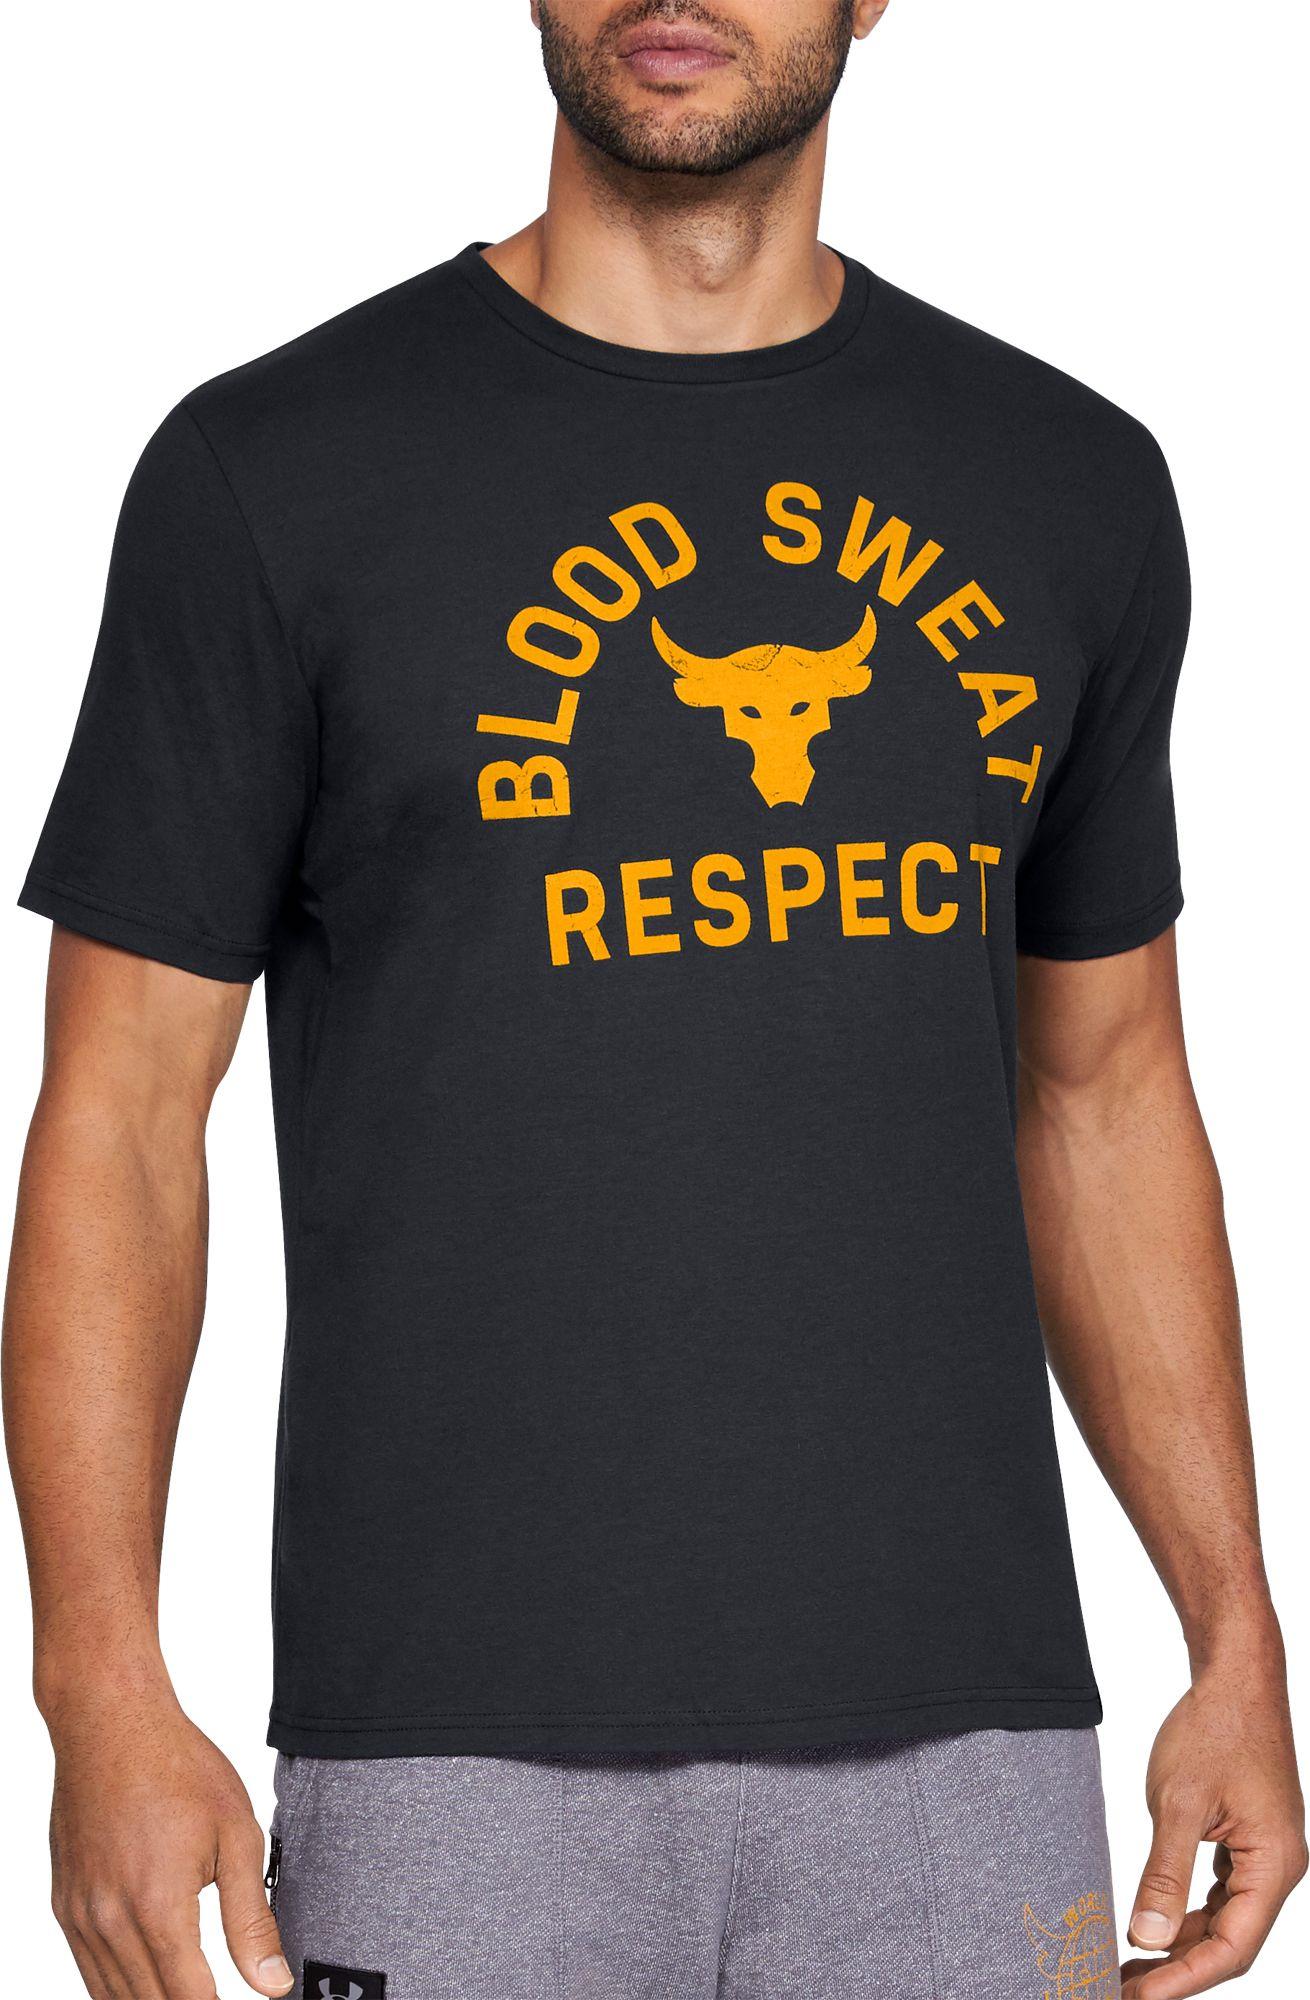 The Rock Project Hoodies Gym Bodybuilding Exercise Funny Birthday Gift Sweatshirt